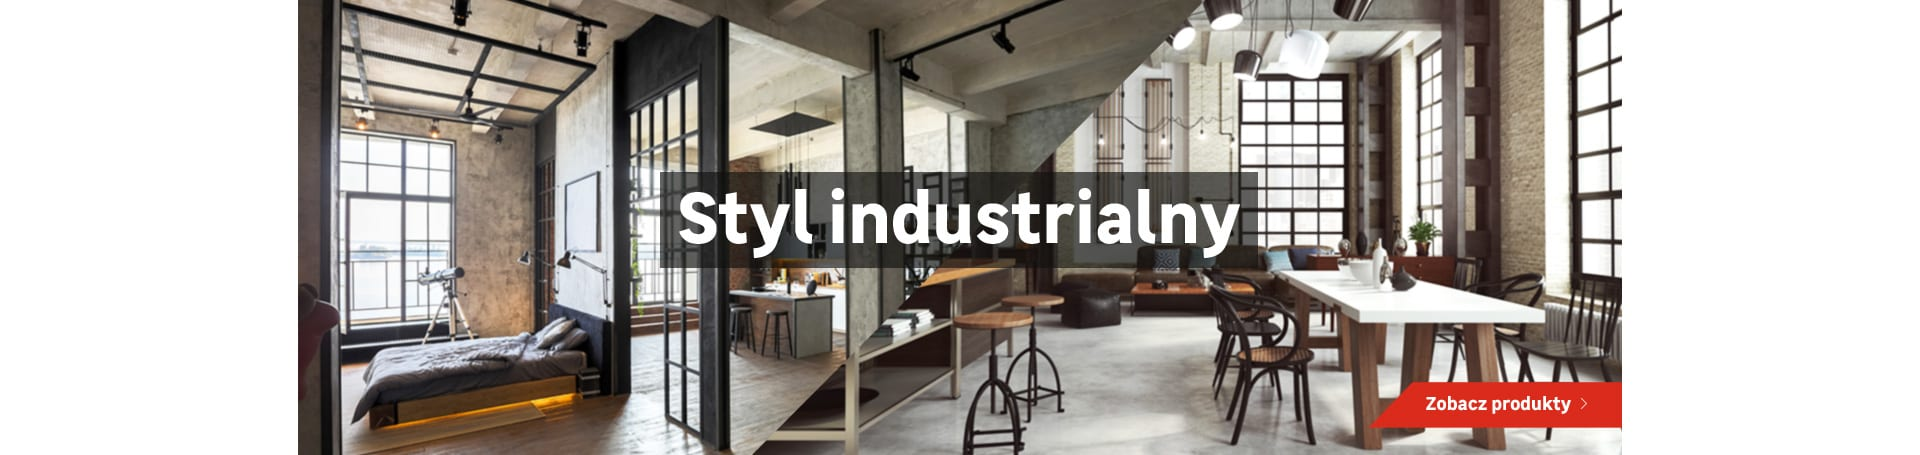 rr-styl-industrianly-5.06-30.06.2019-1323x455